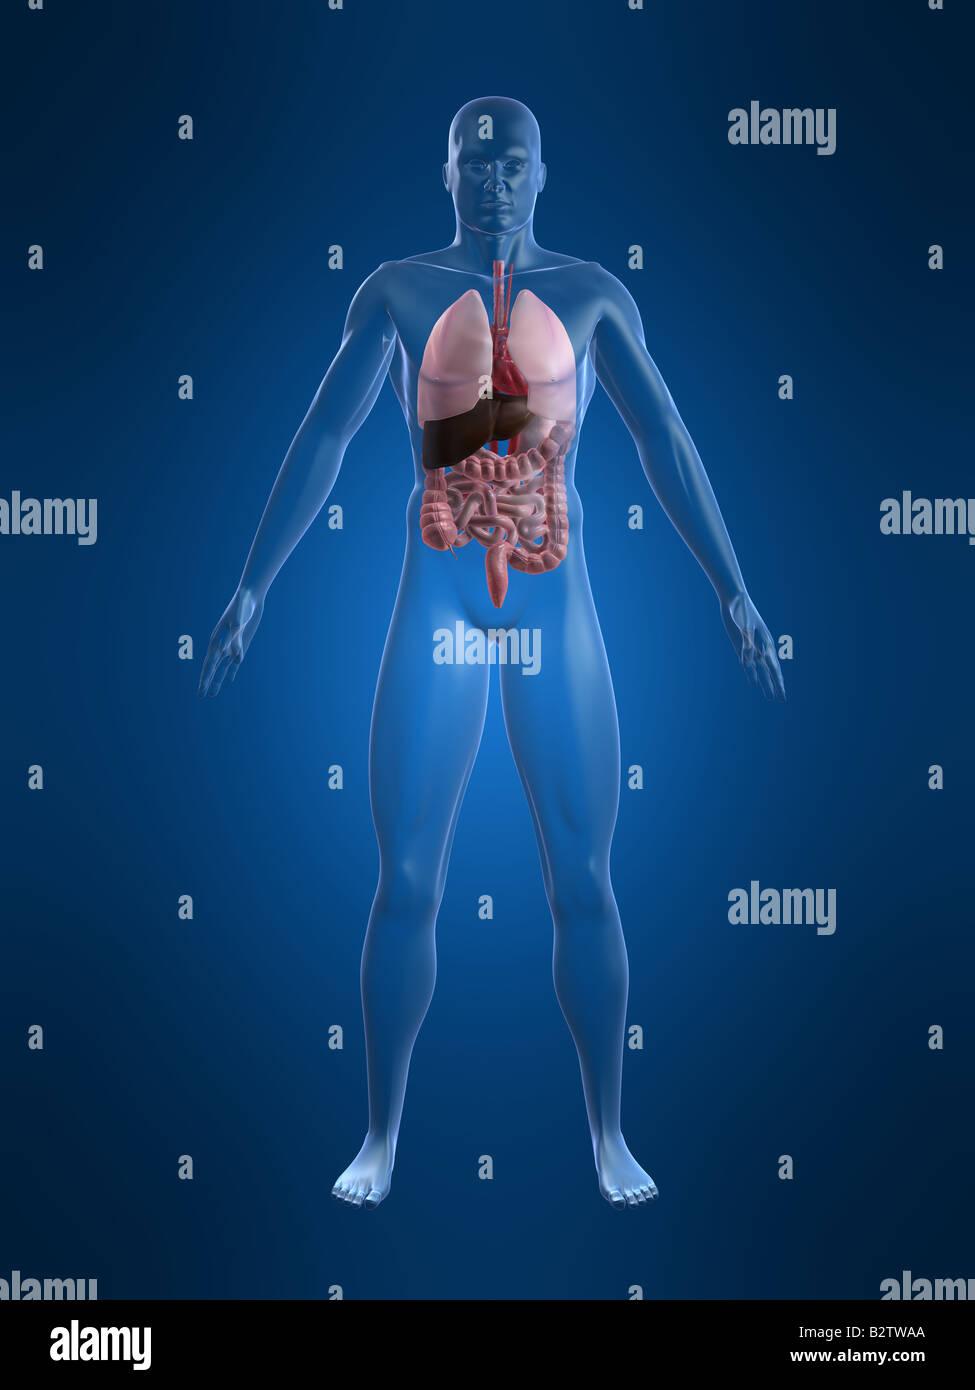 human anatomy - Stock Image